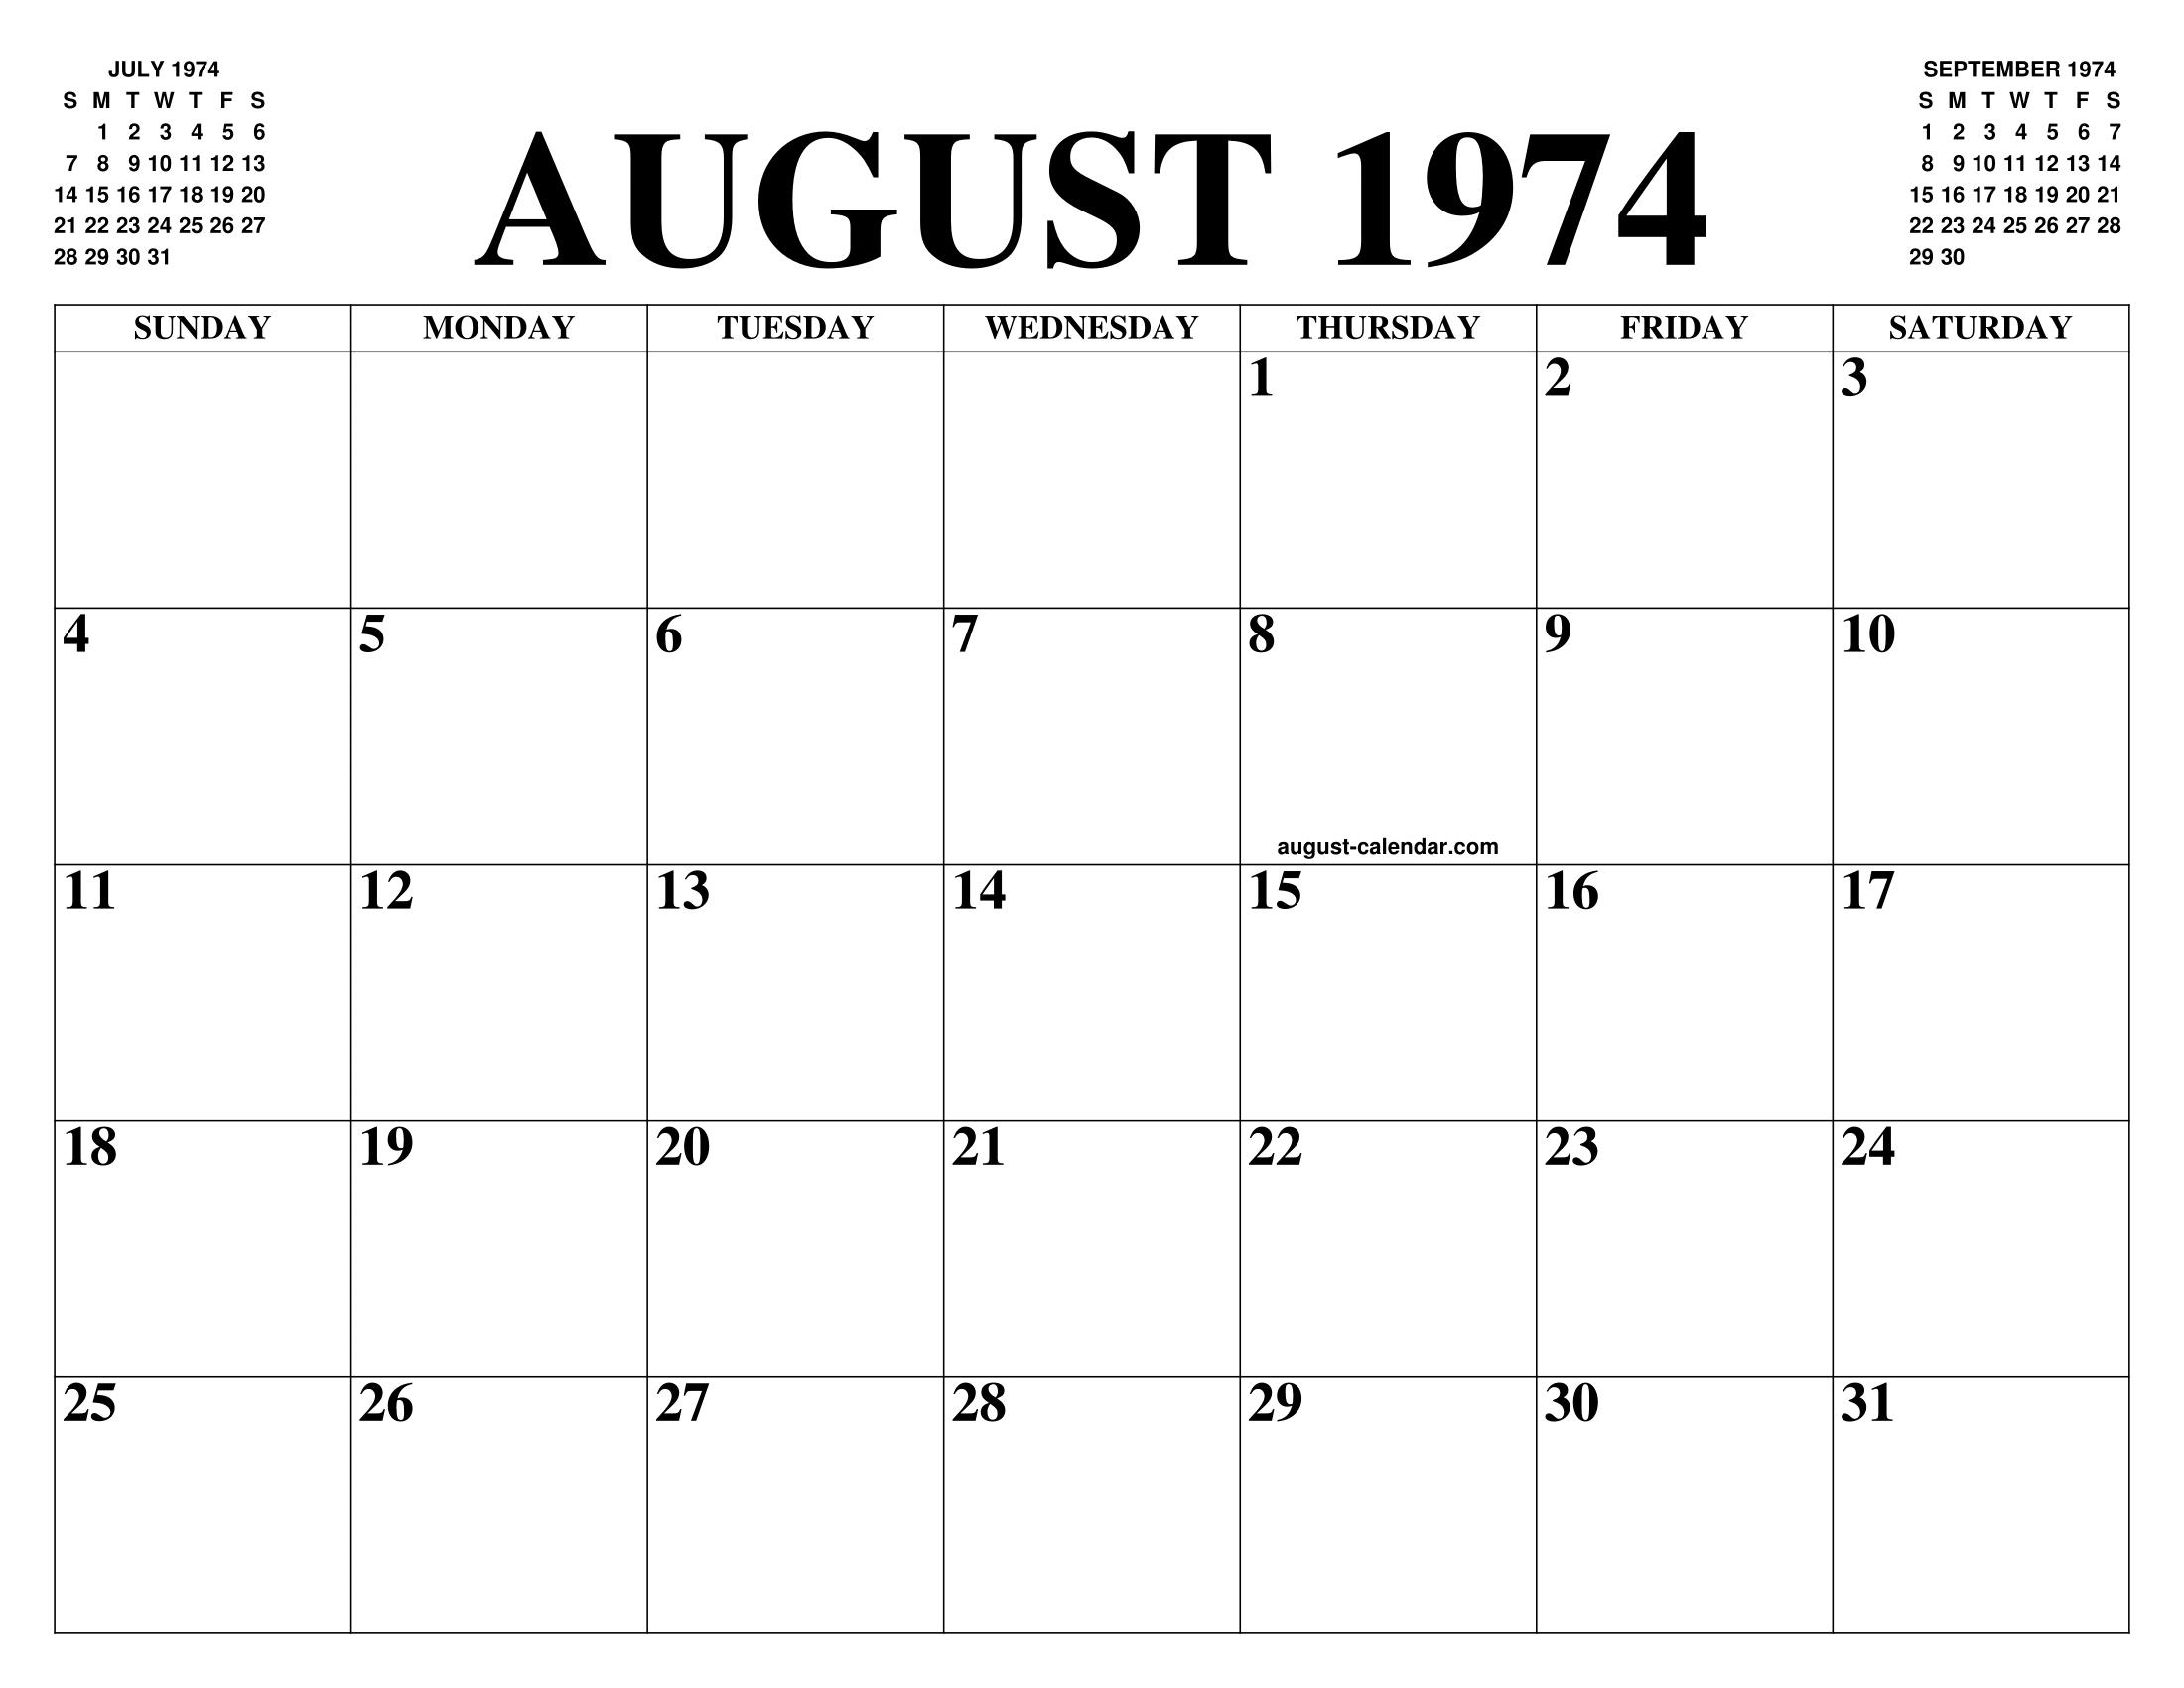 Calendario 1974.August 1974 Calendar Of The Month Free Printable August